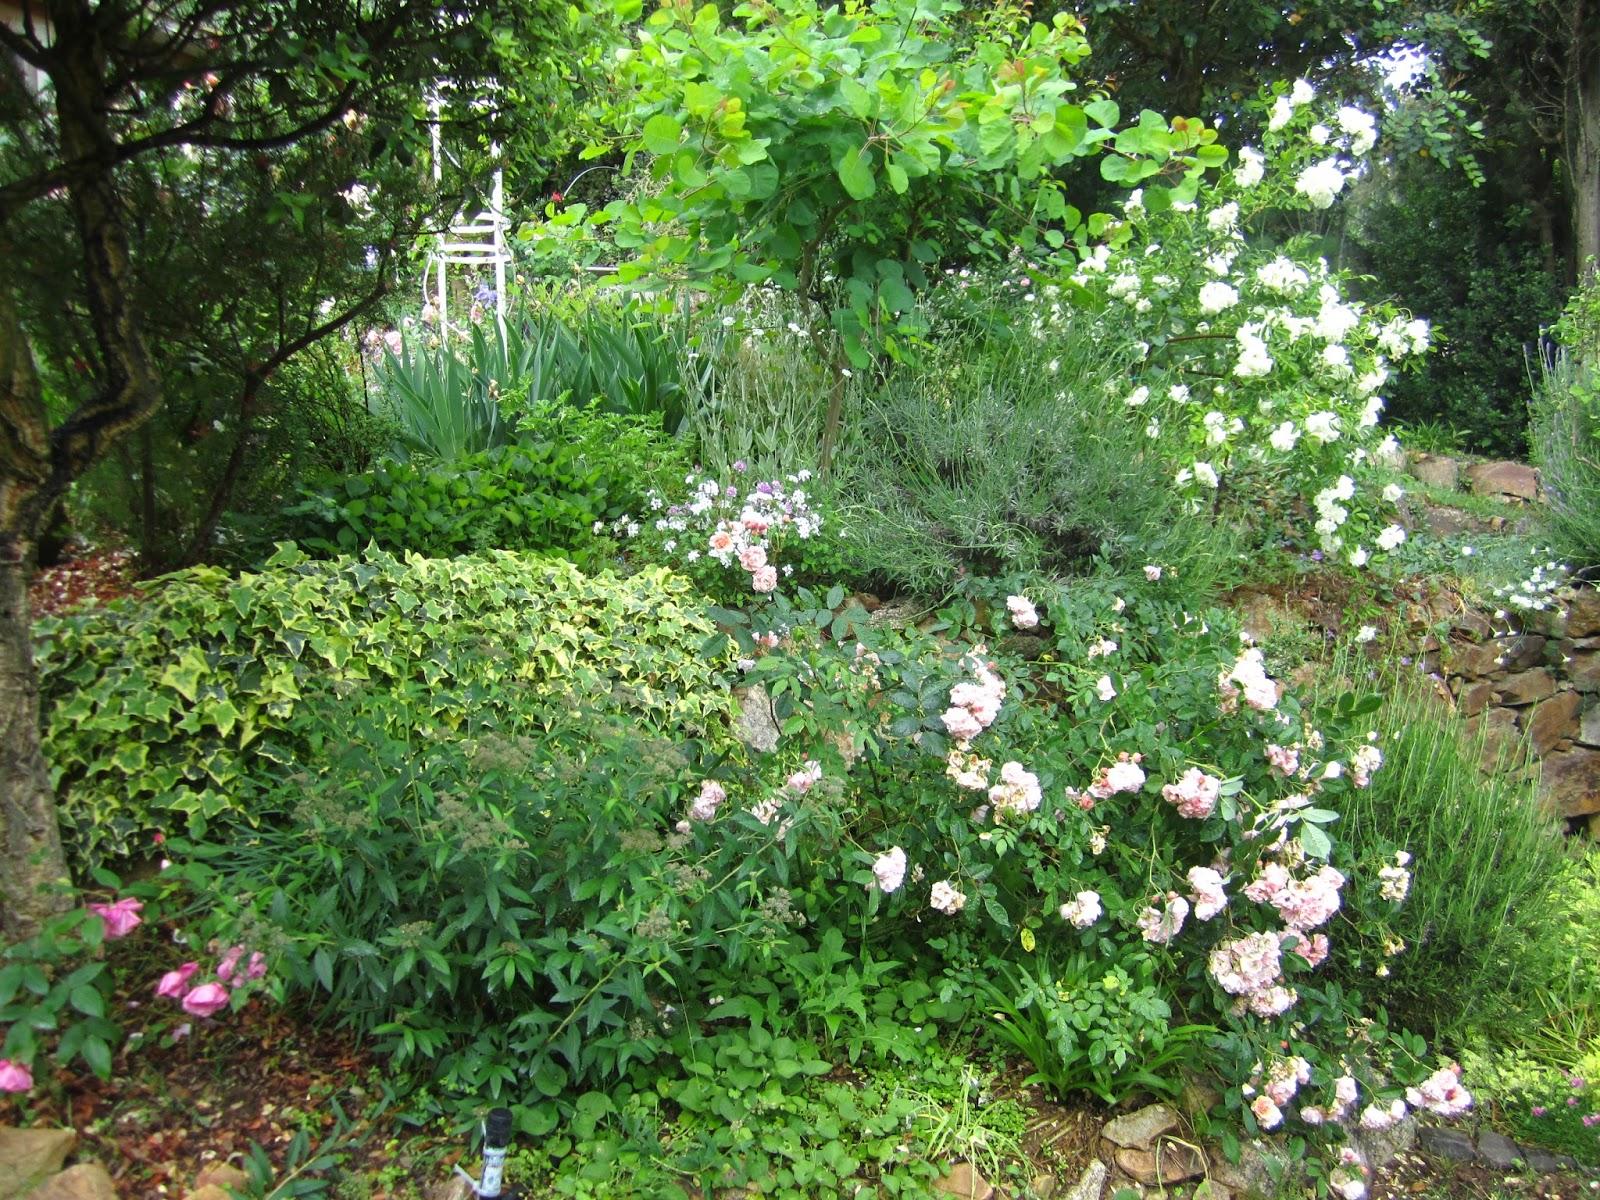 maggio 2015 - Furighedda gardening